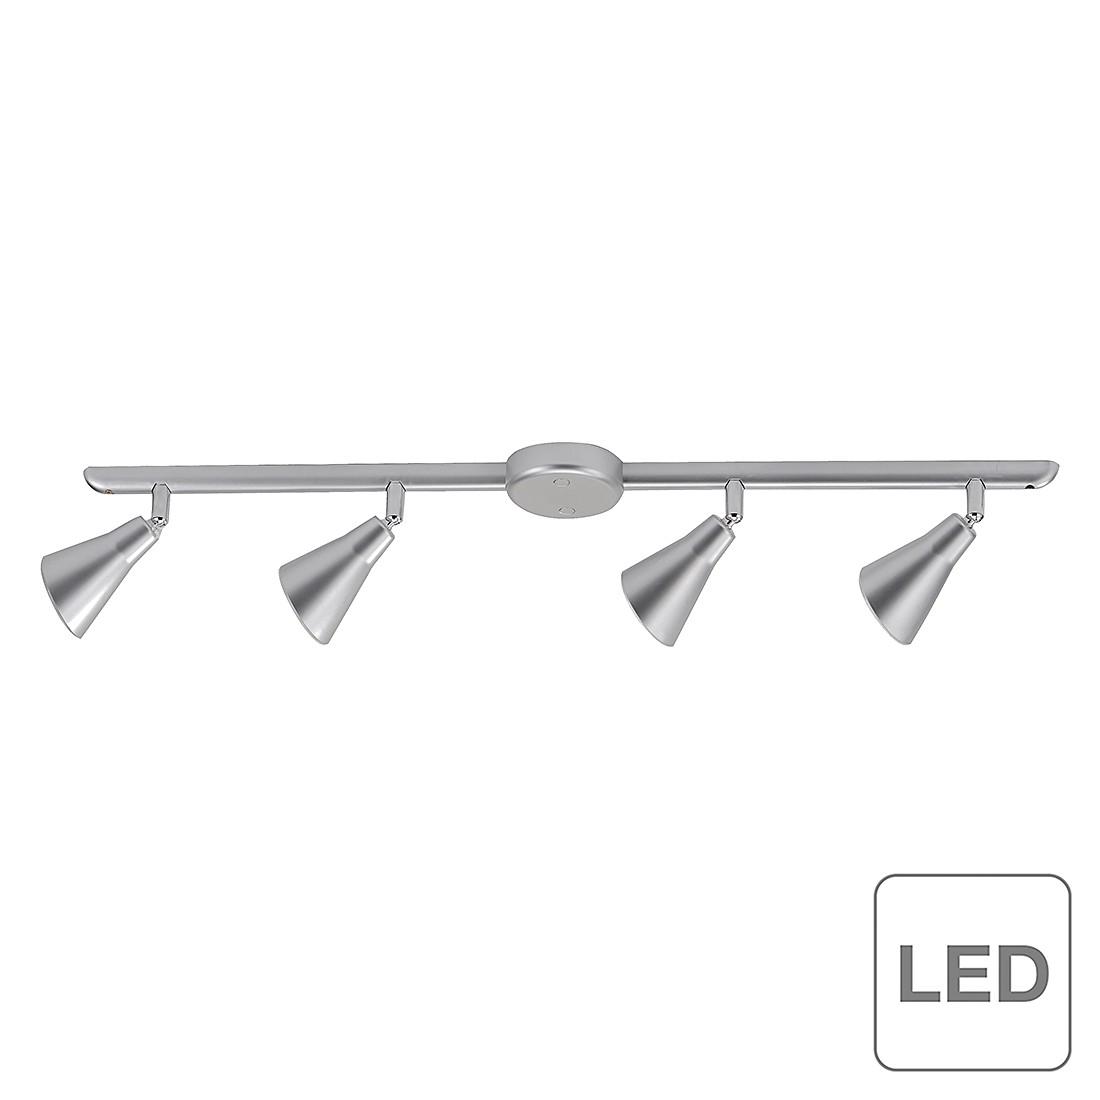 Lampada da soffitto LED Diallo, Leuchten Direkt